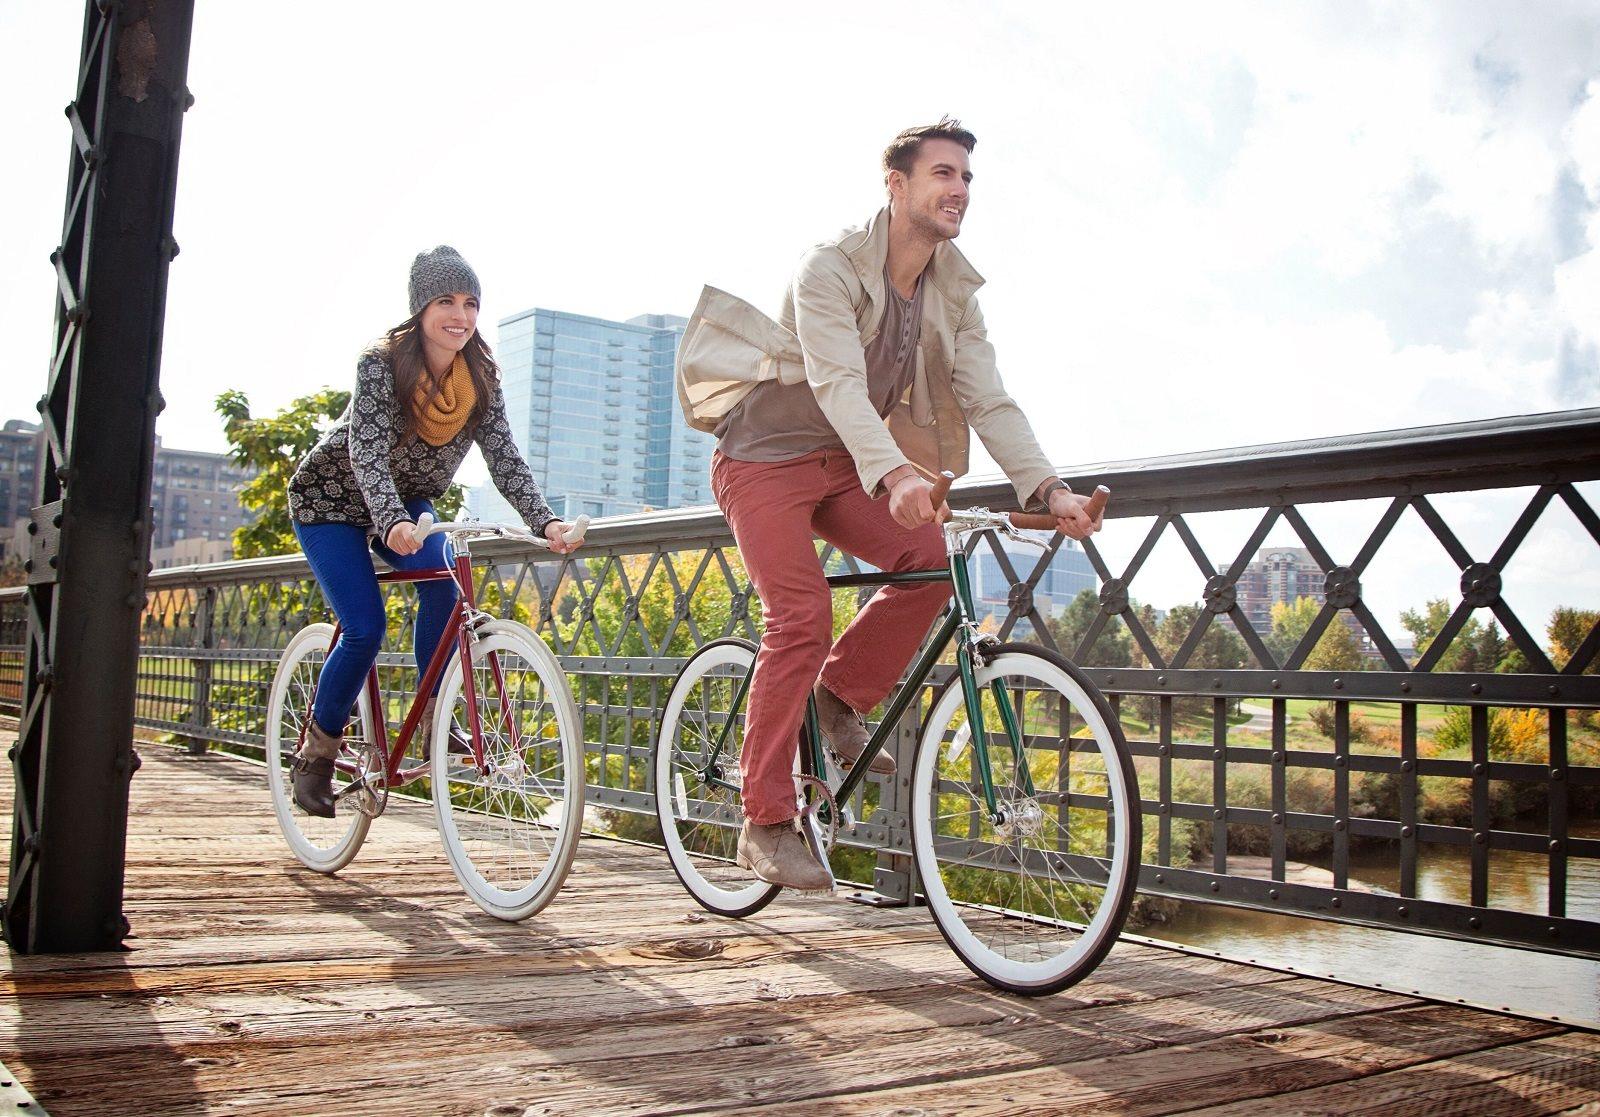 Bike Lockers and Racks at Touchstone Modern Apartment Homes, 11996 Ridge Parkway, Broomfield, CO 80021